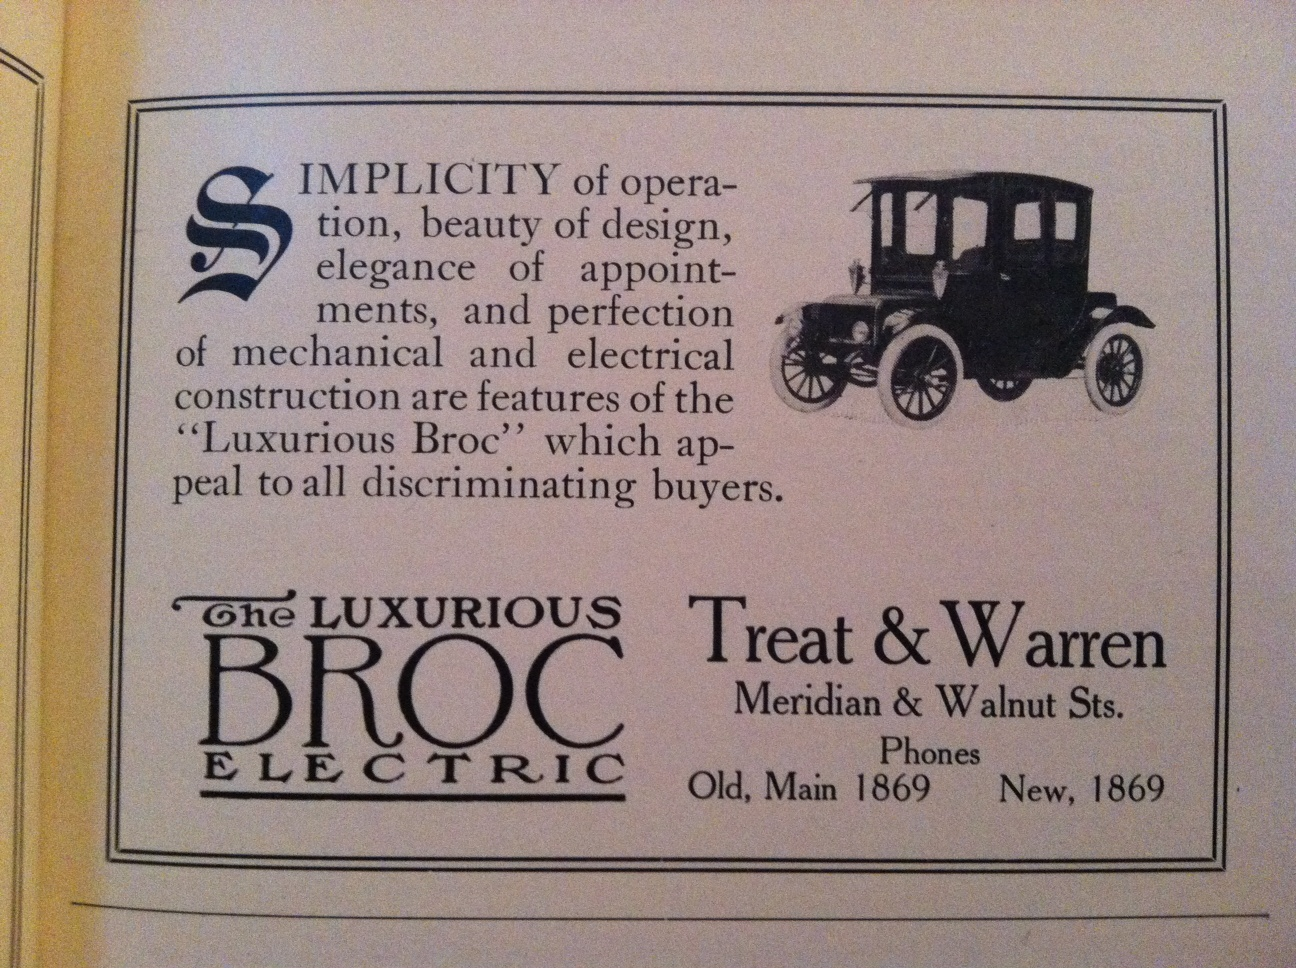 Sunday Adverts: Treat and Warren